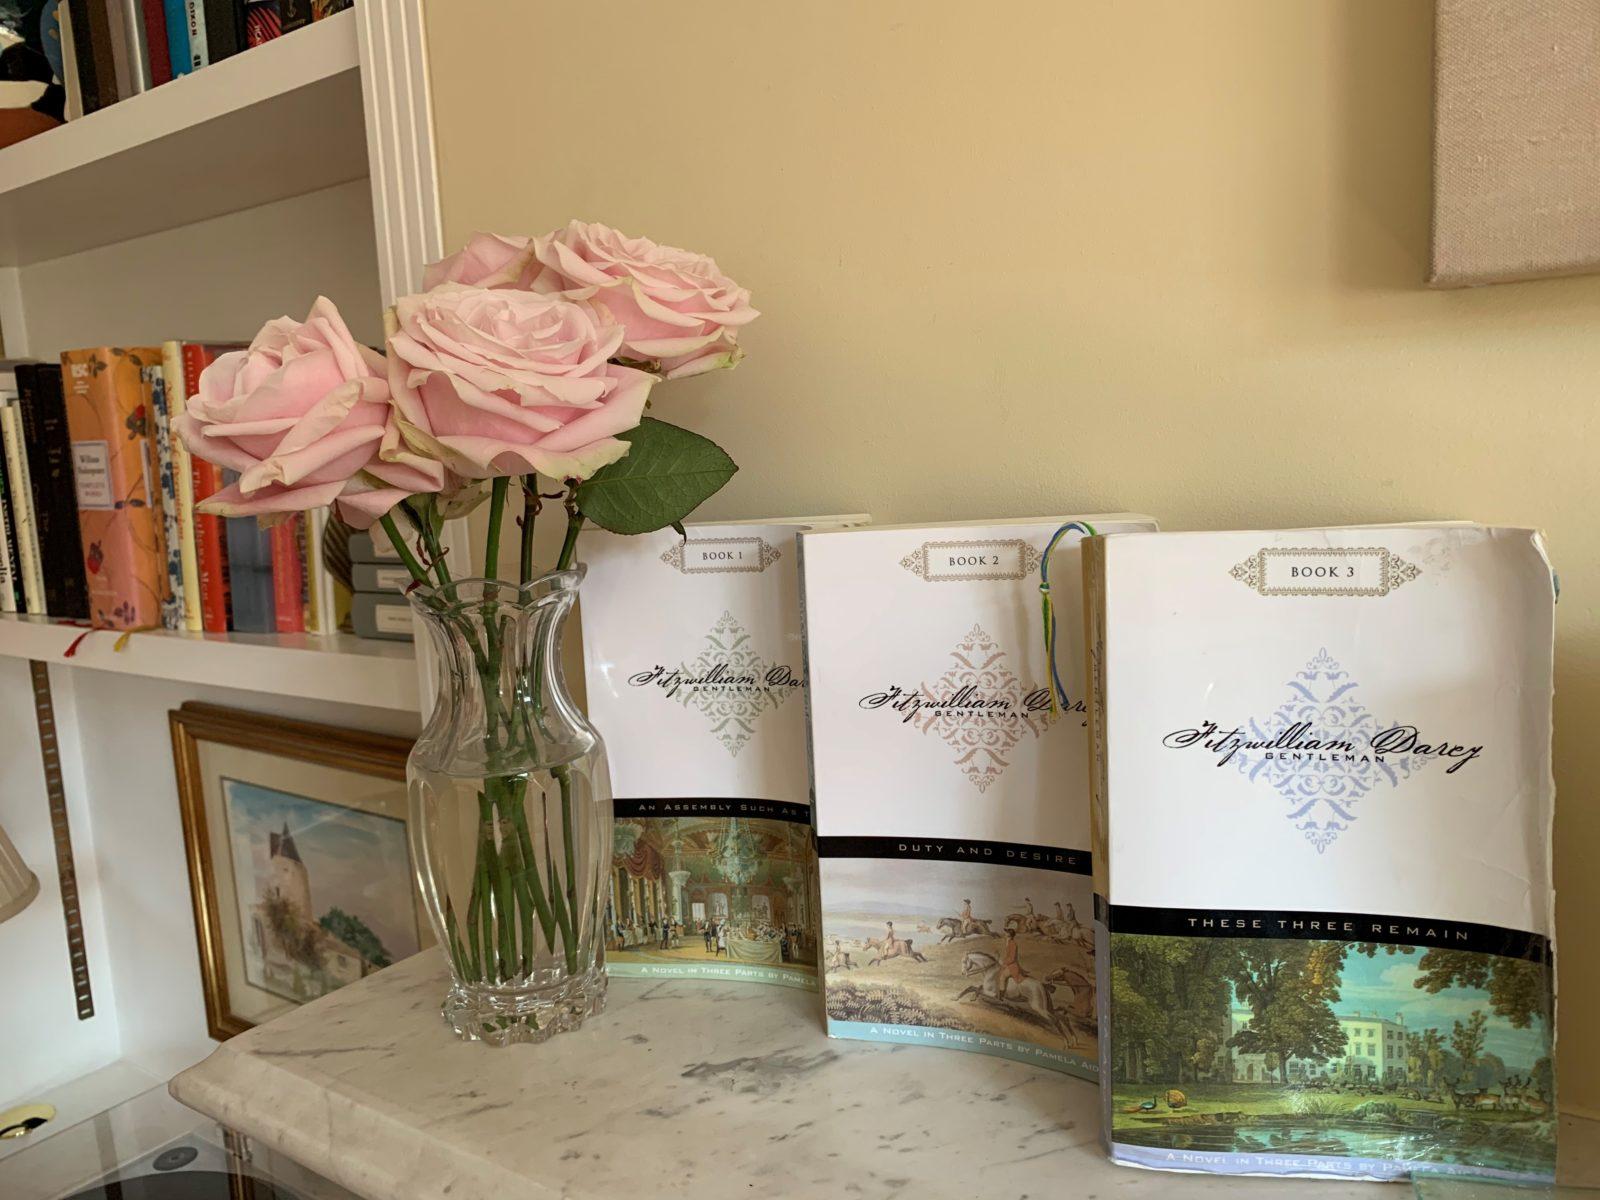 Pamela Aidan's Fitzwilliam Darcy trilogy